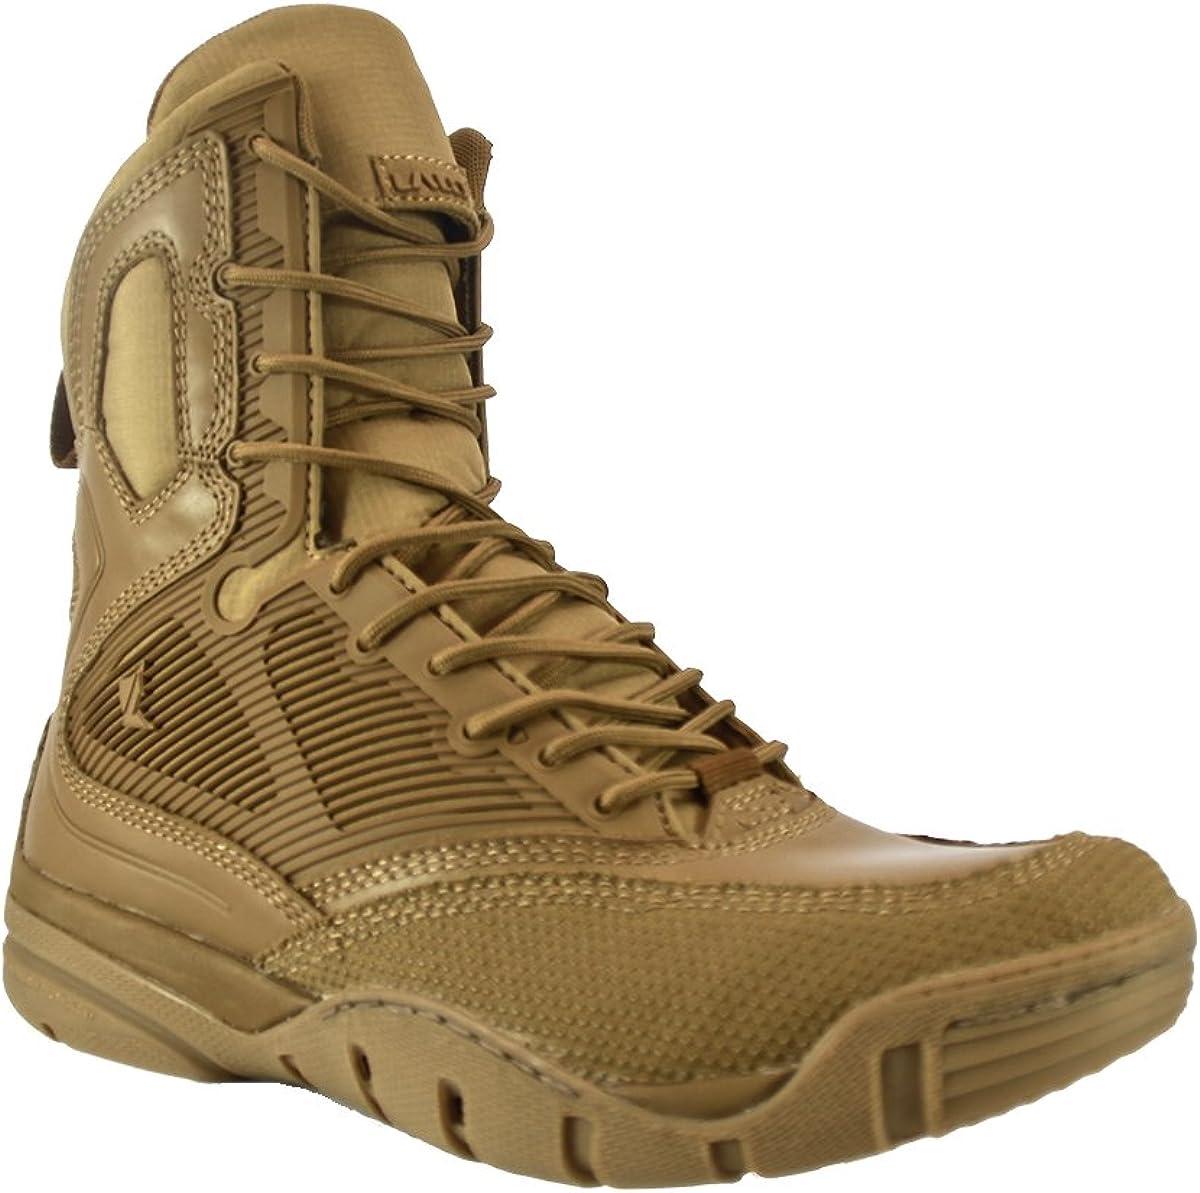 LALO Mens Shadow Amphibian 8 Drainable Tactical Boot